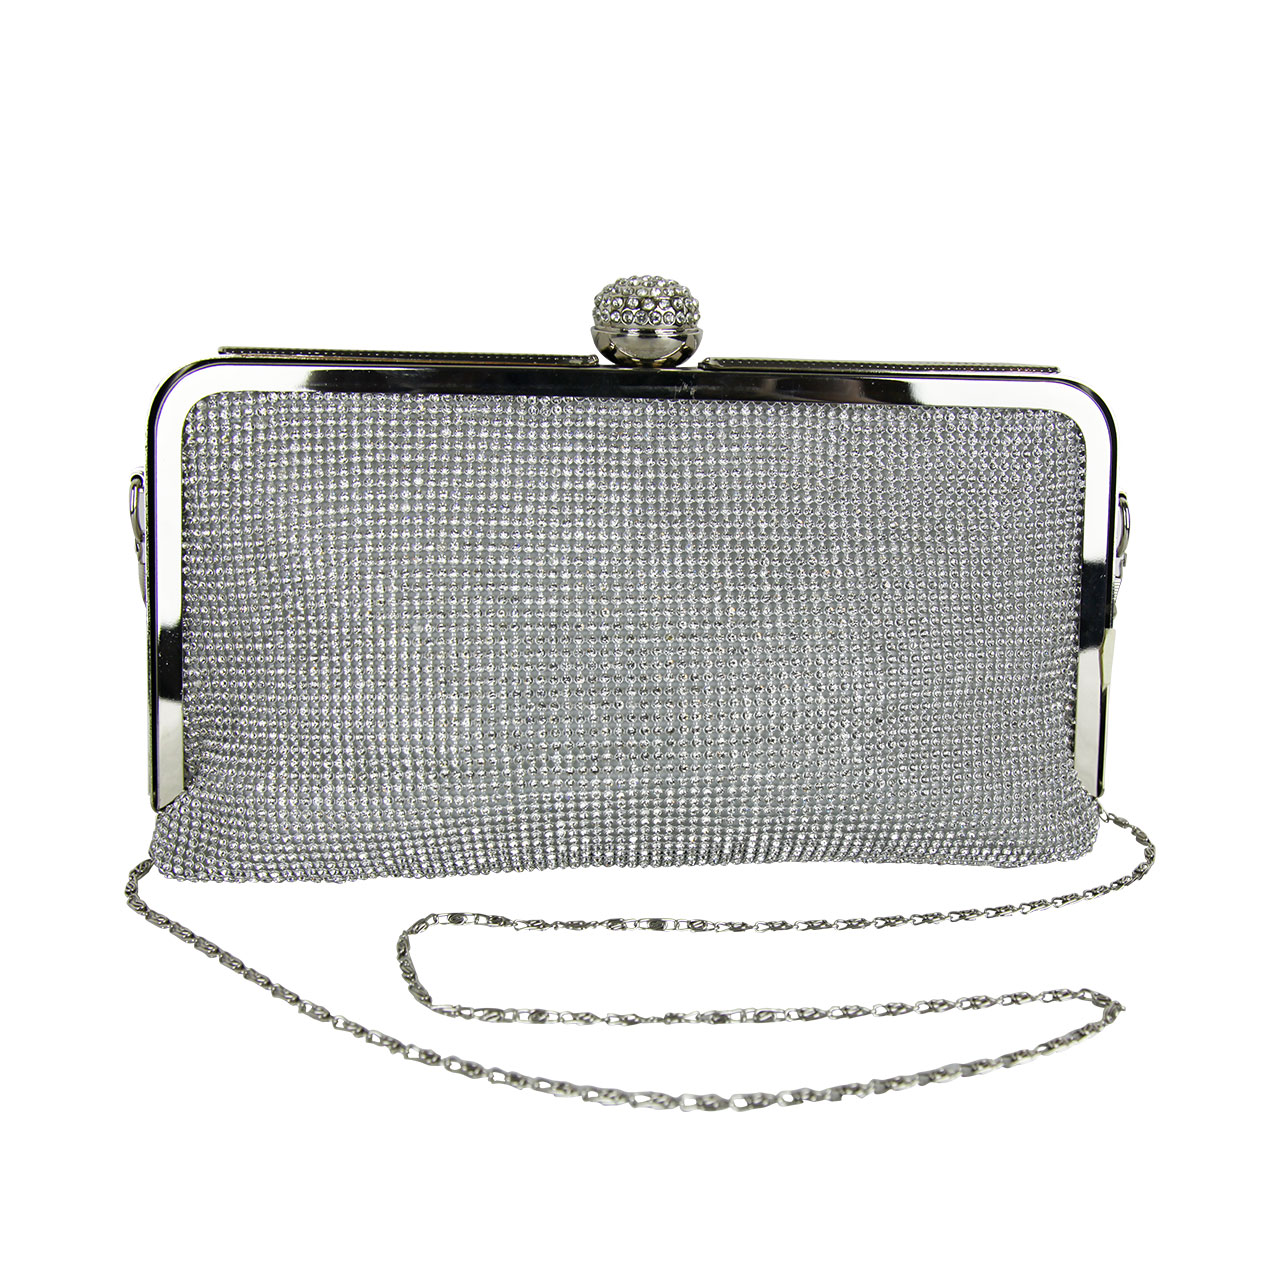 Women Silver Glitter Clutch Bag With Chain